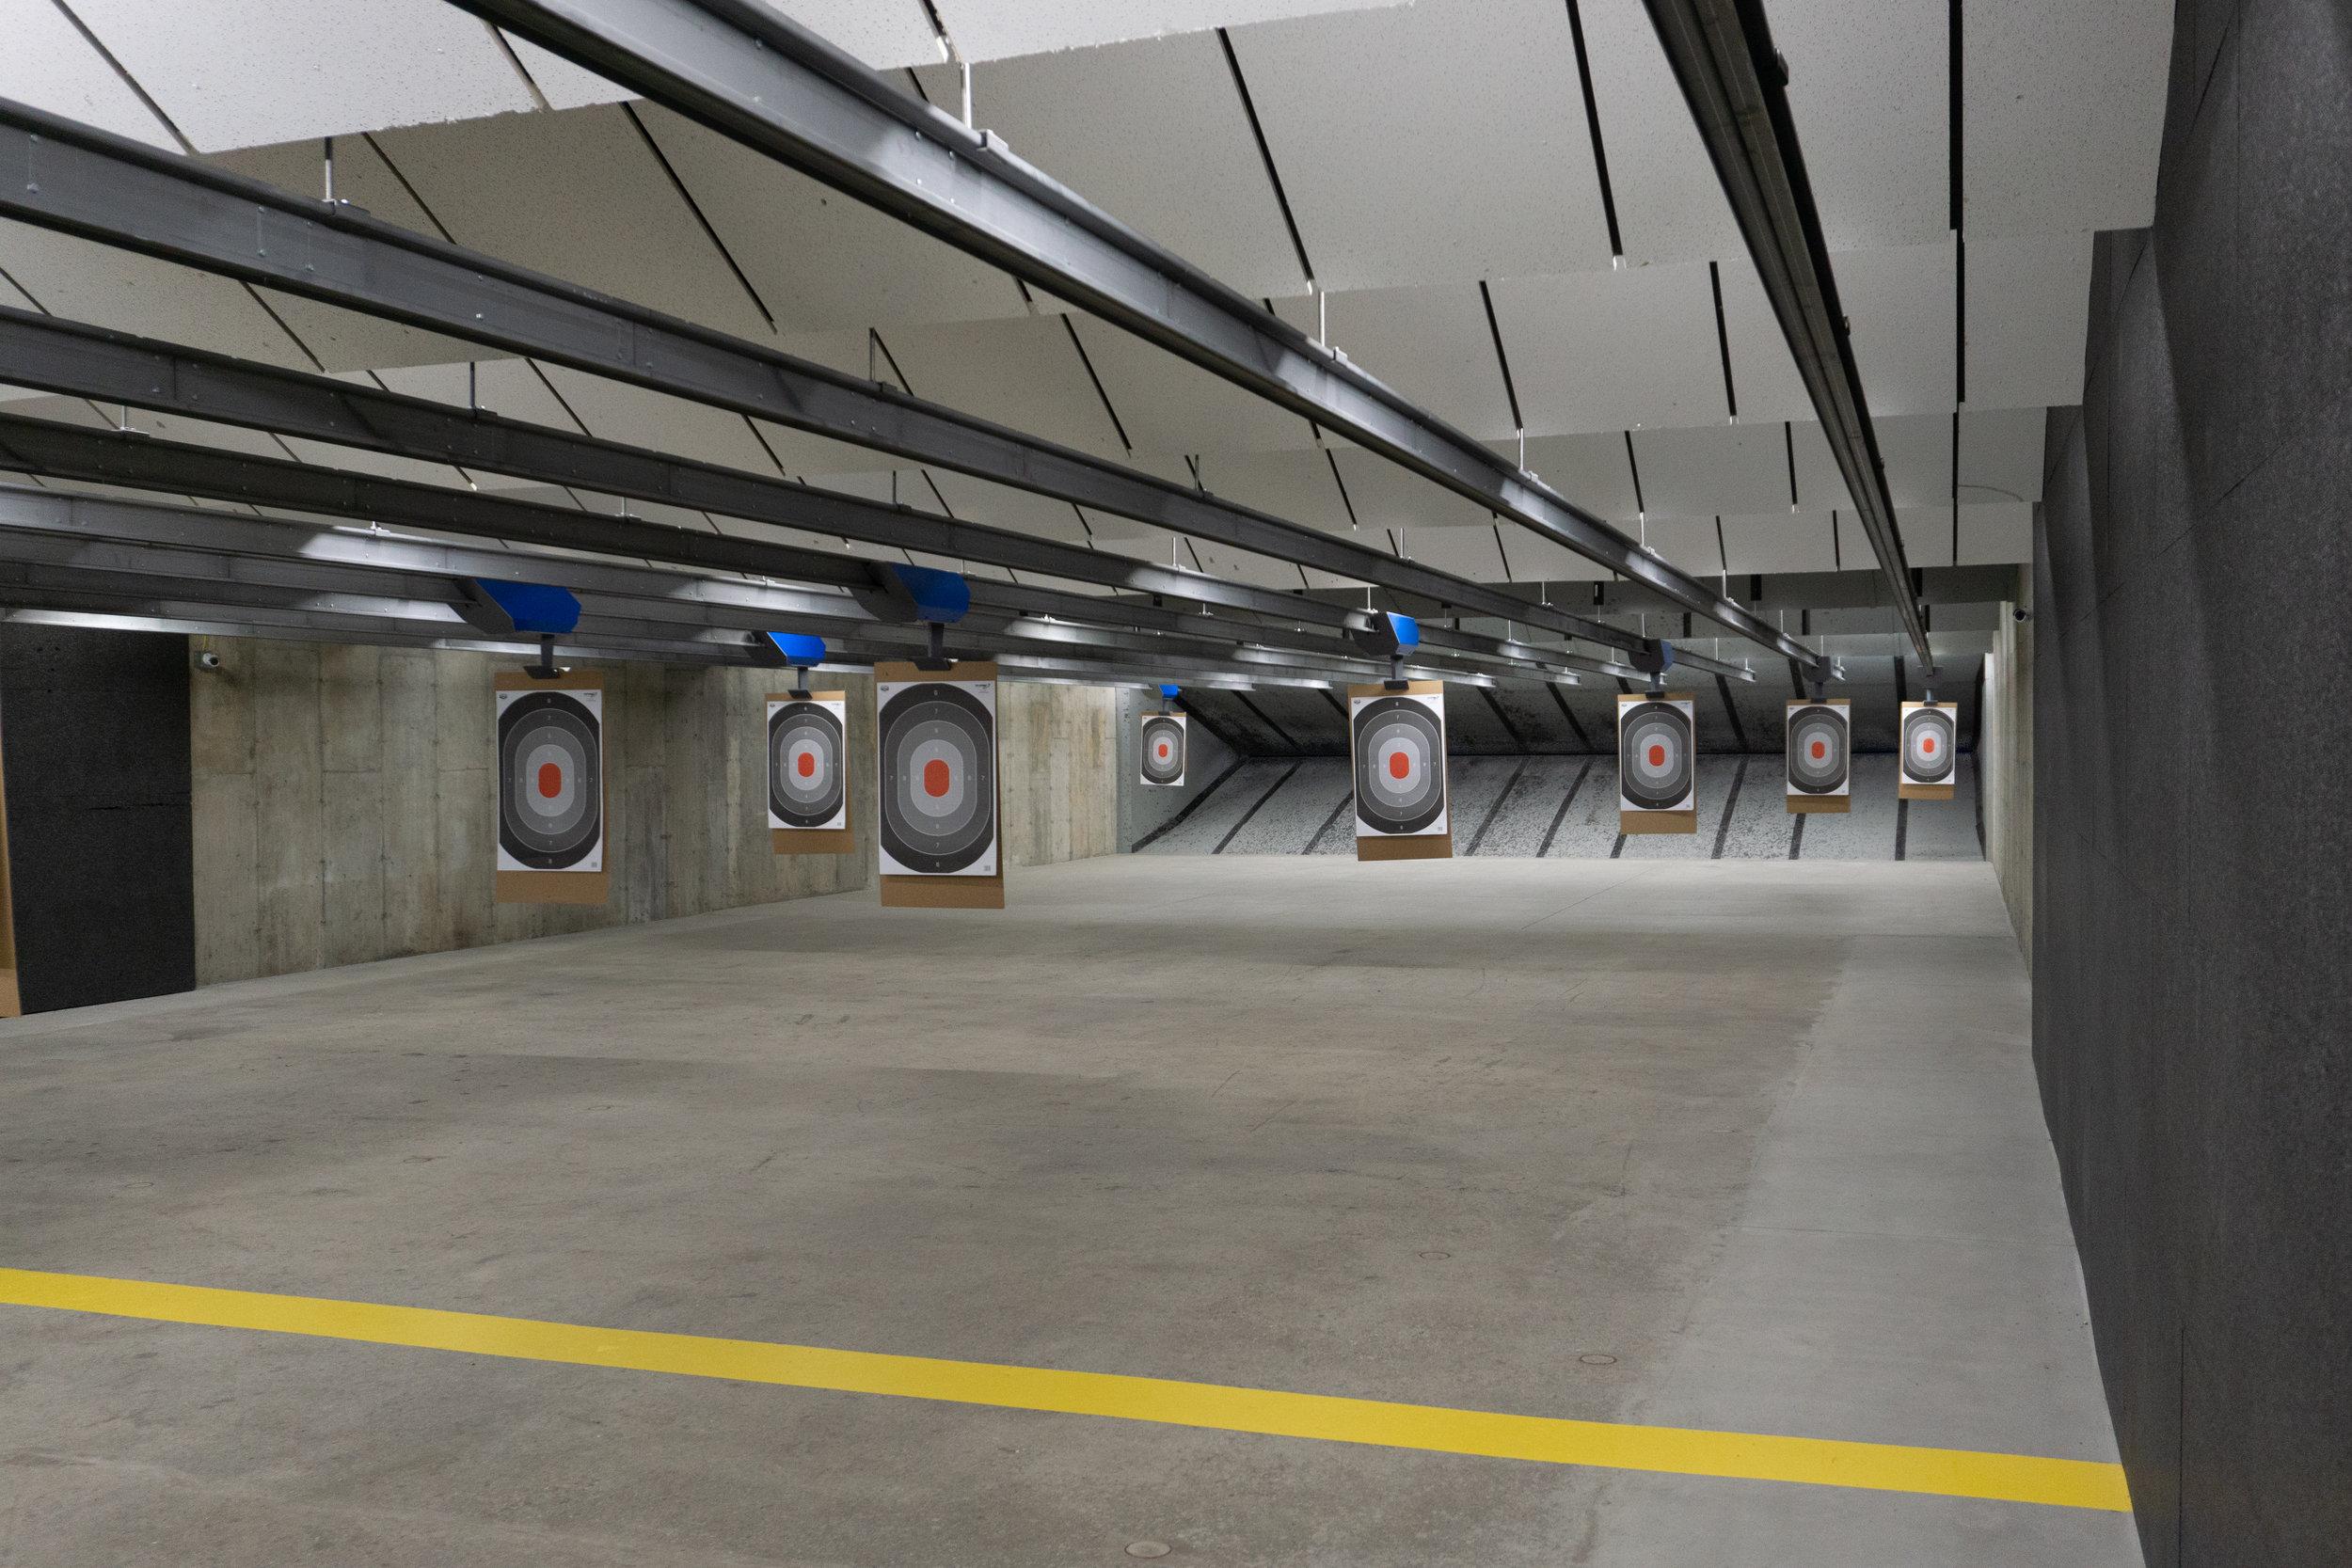 Springfield shooting range